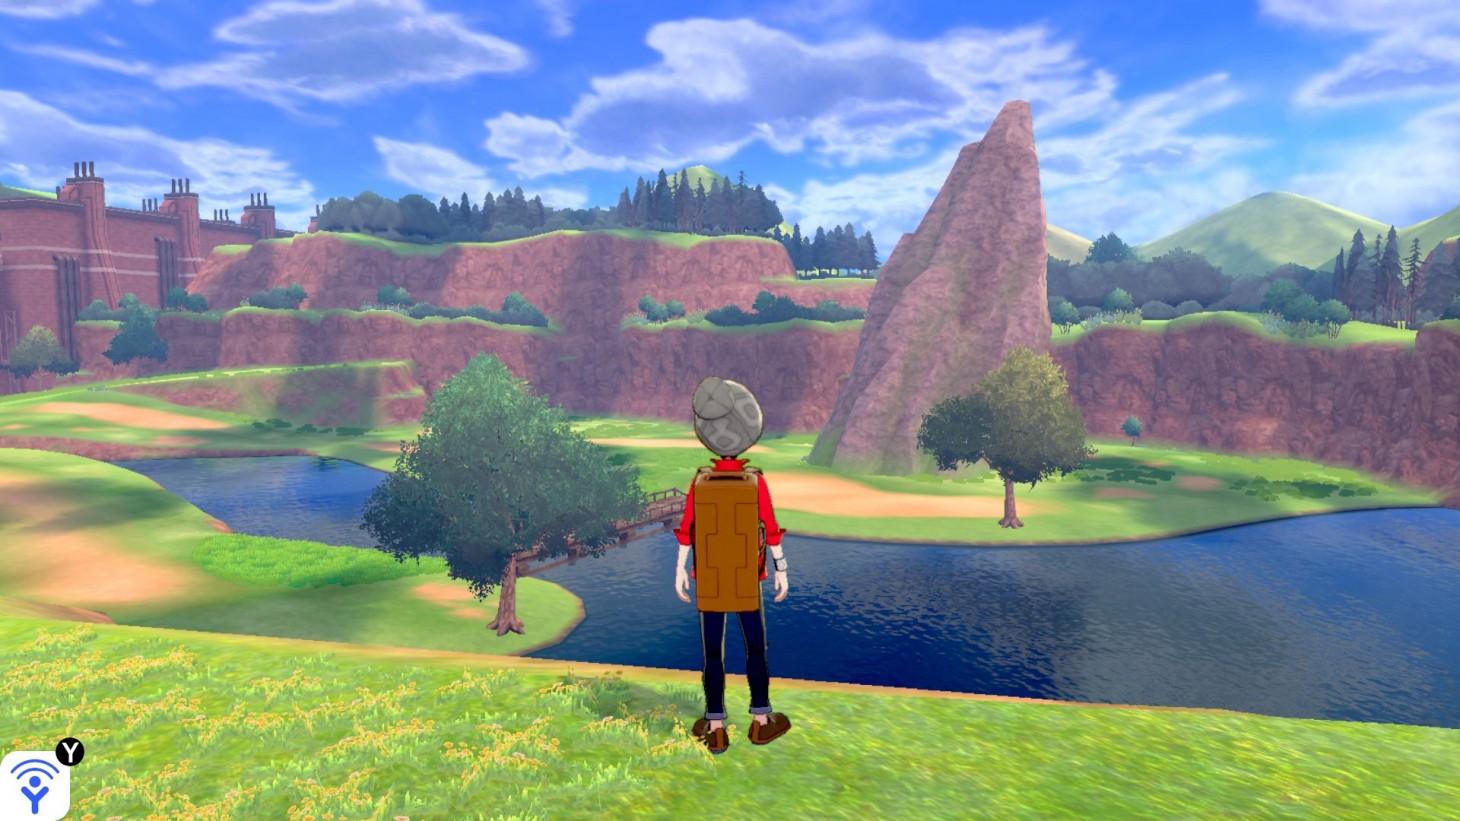 Pokemon Sword and Shield final trailer ups the ante